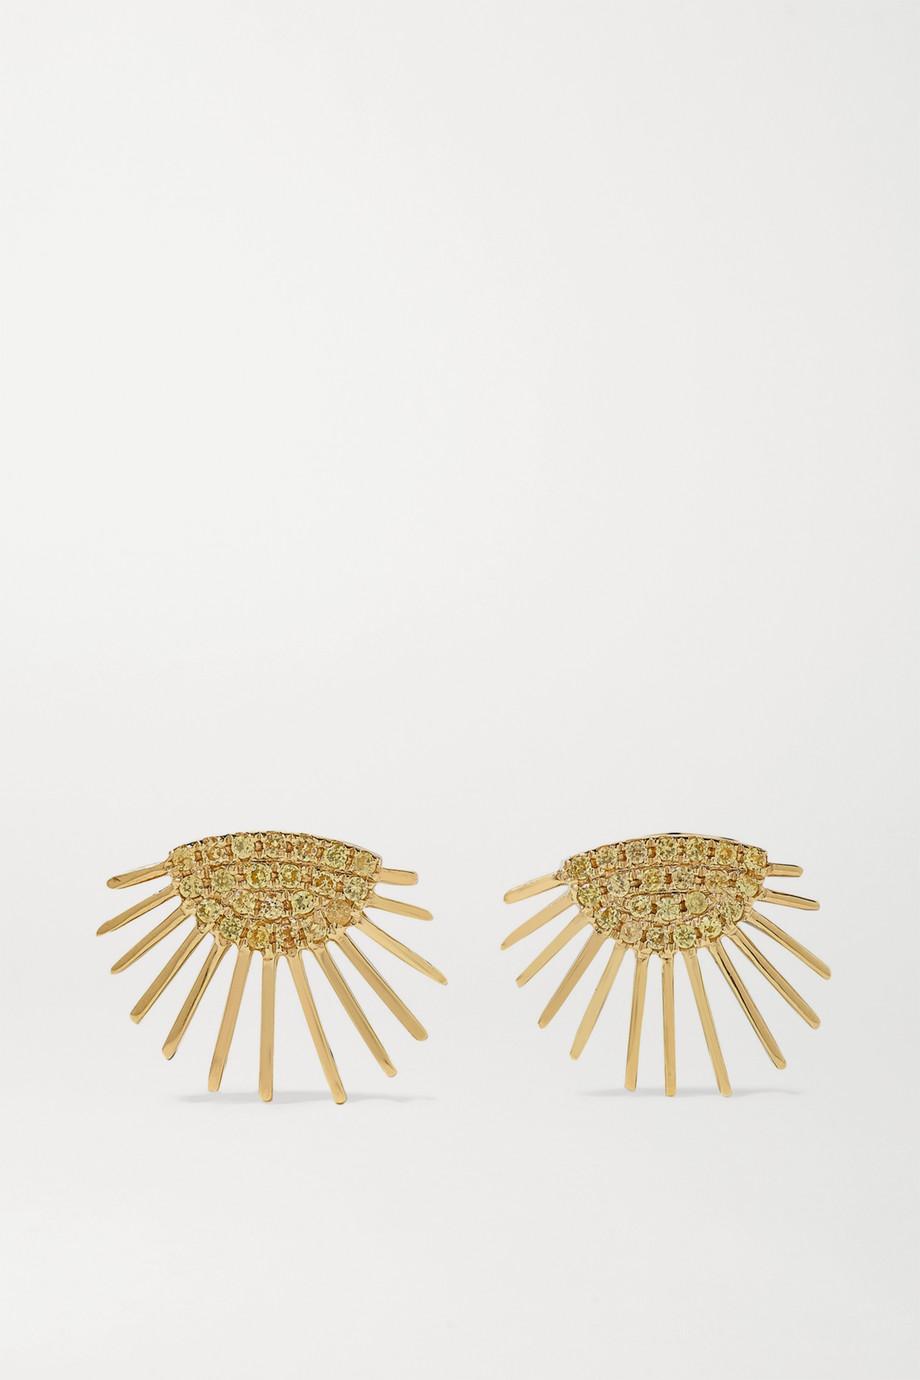 Yvonne Léon 18-karat gold sapphire earrings